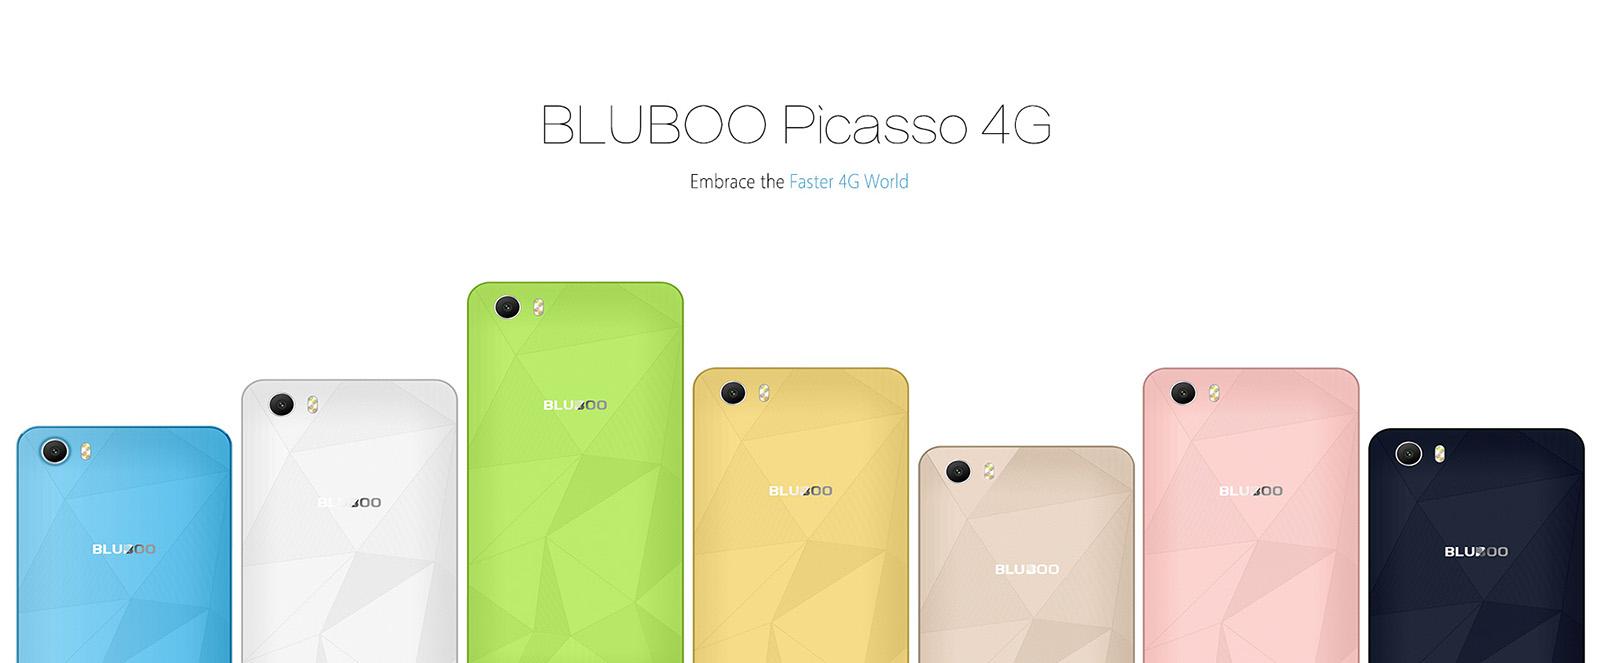 Bluboo Picasso 4G